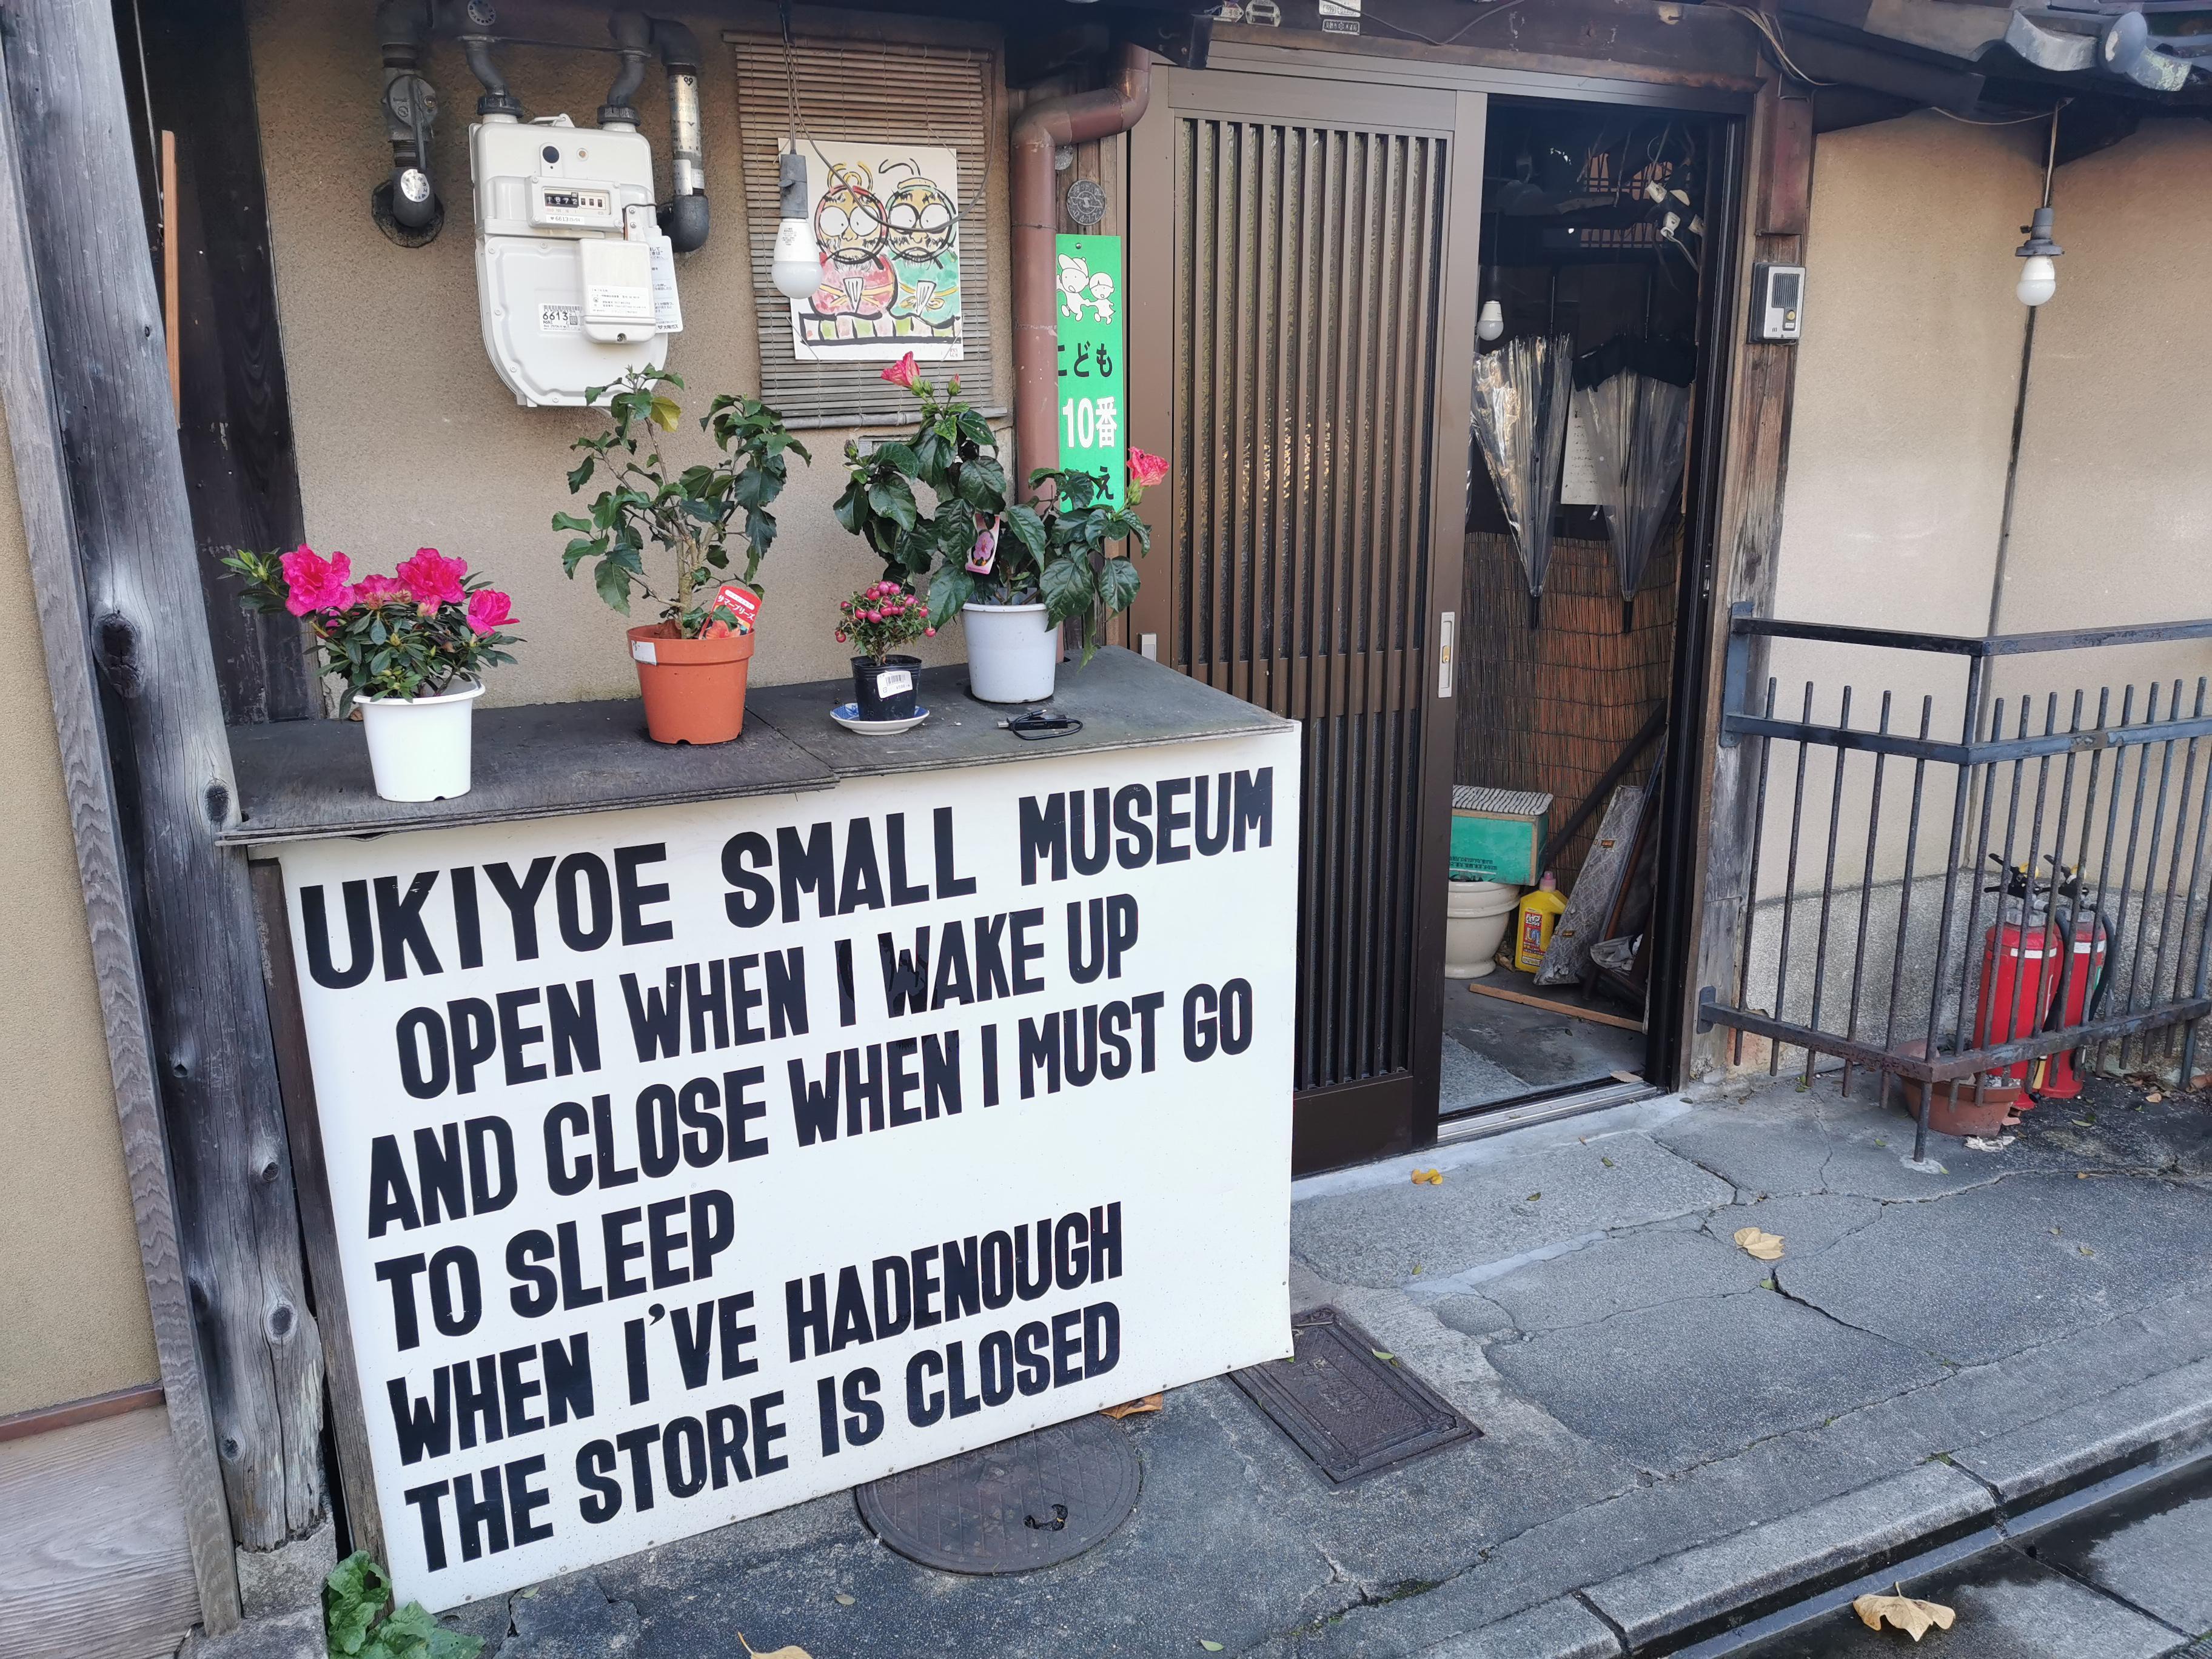 Ukiyoe Small Museum of print art in Kyoto Japan